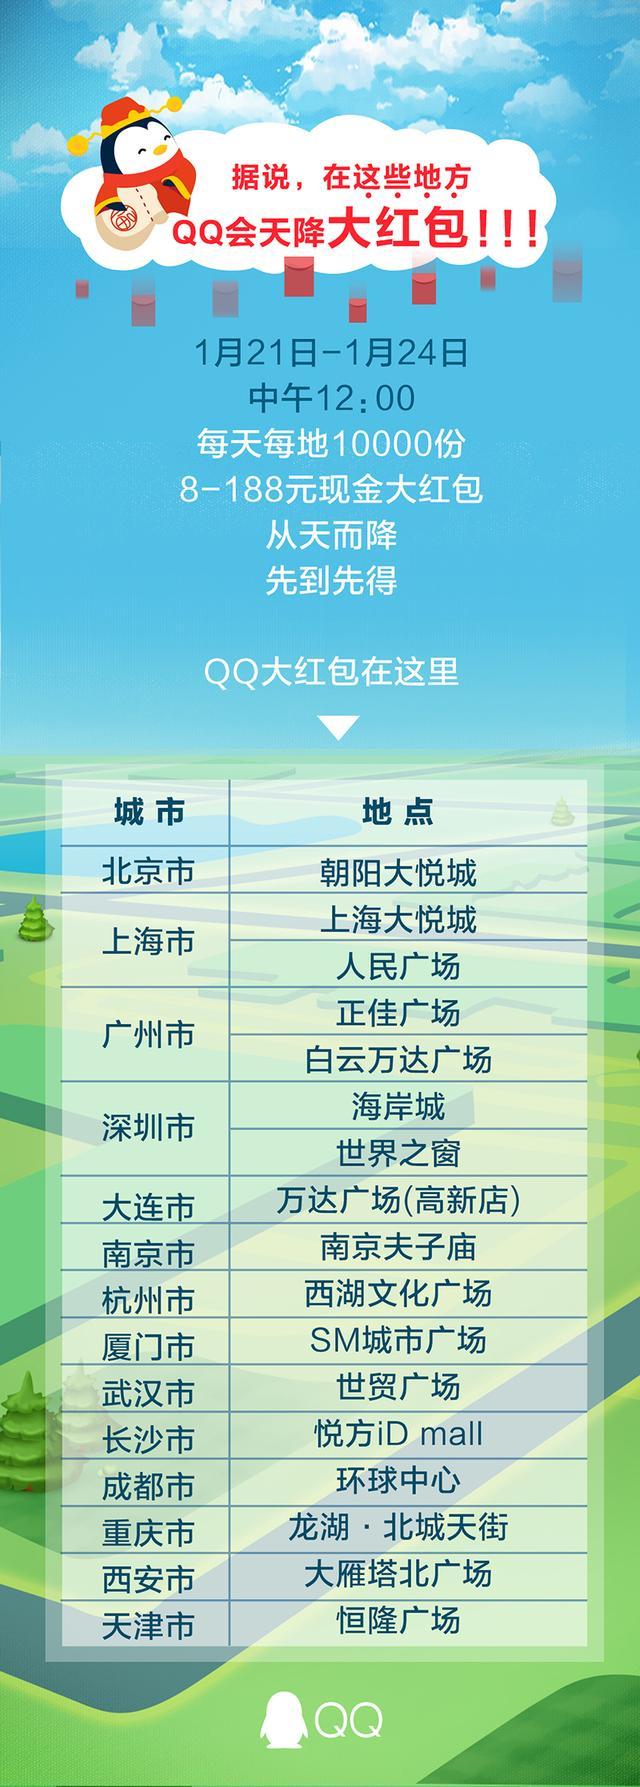 QQ AR红包开抢瓜分2.5亿现金 抢红包入口汇总